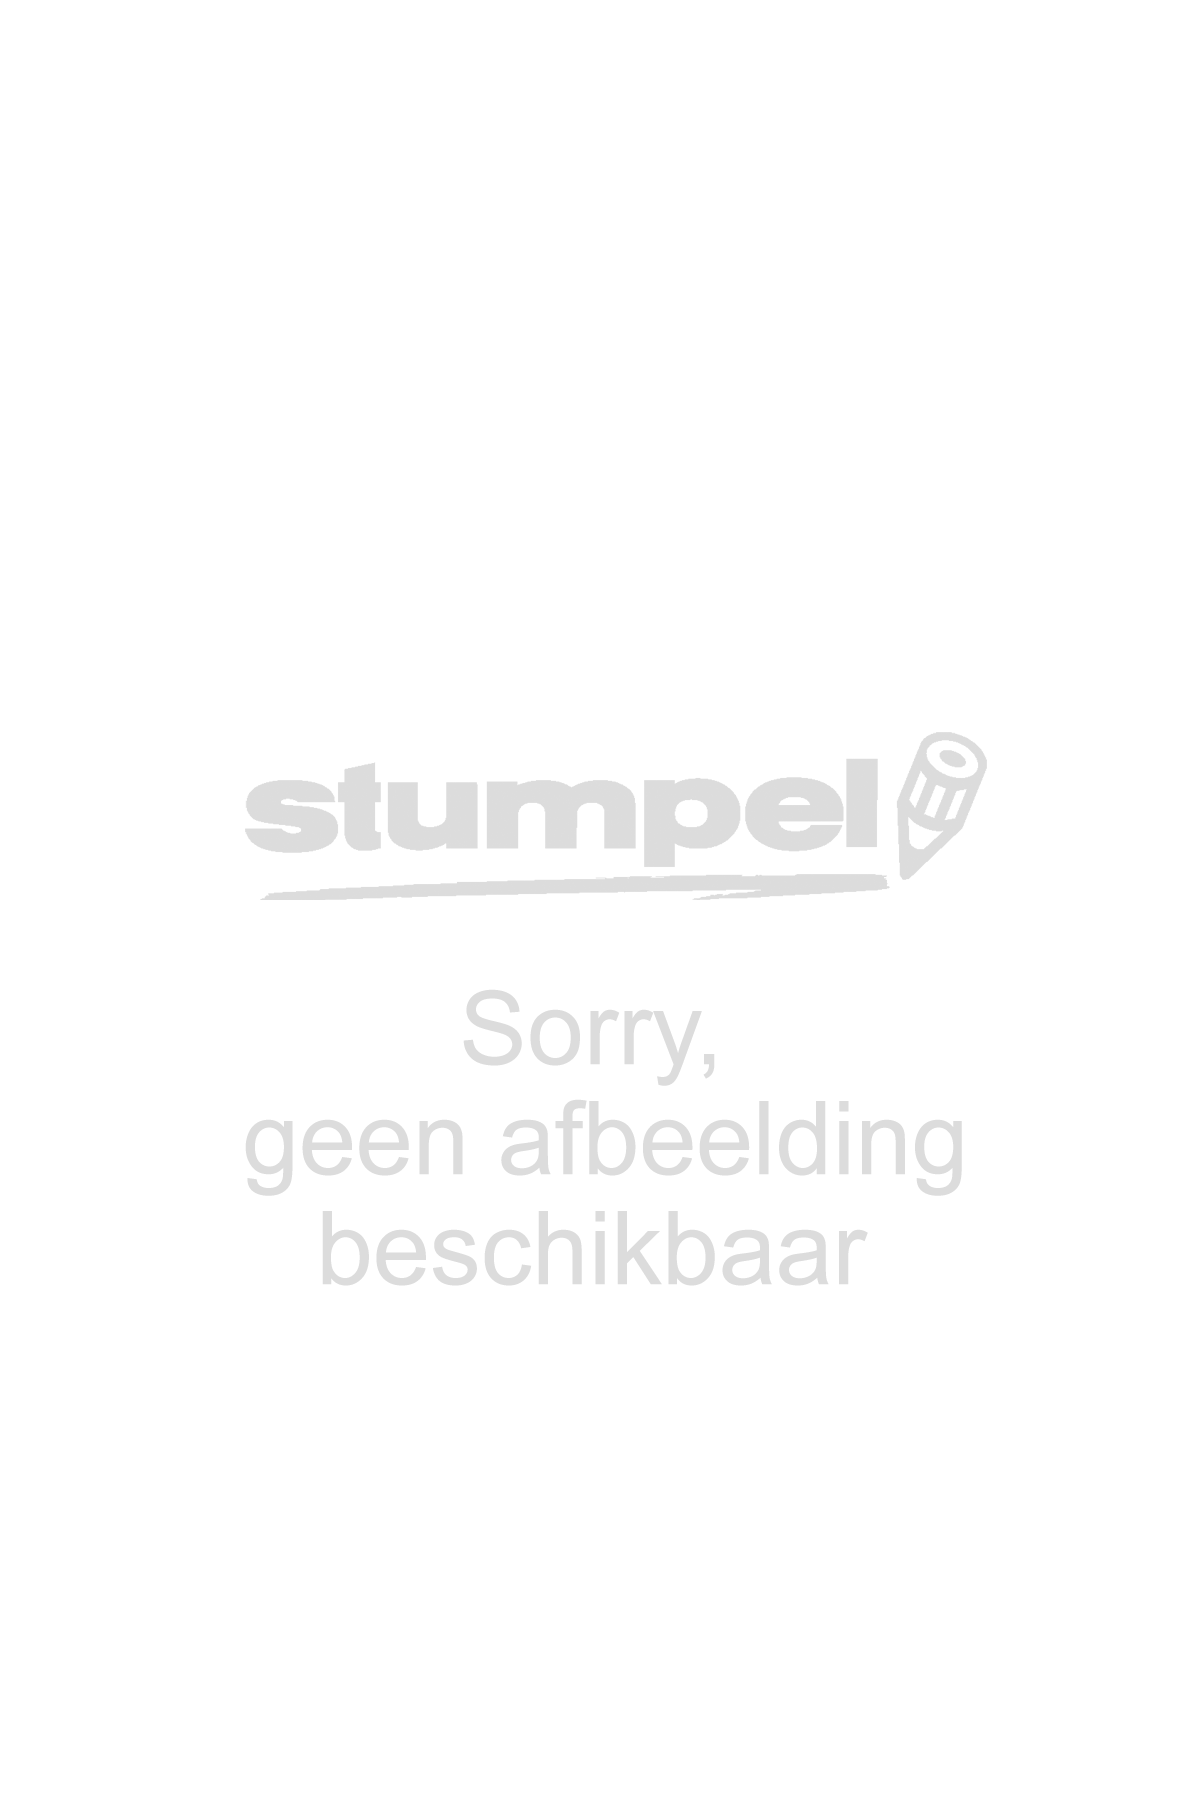 scheurkalender-2021-21-trumpisms-amp-11015378